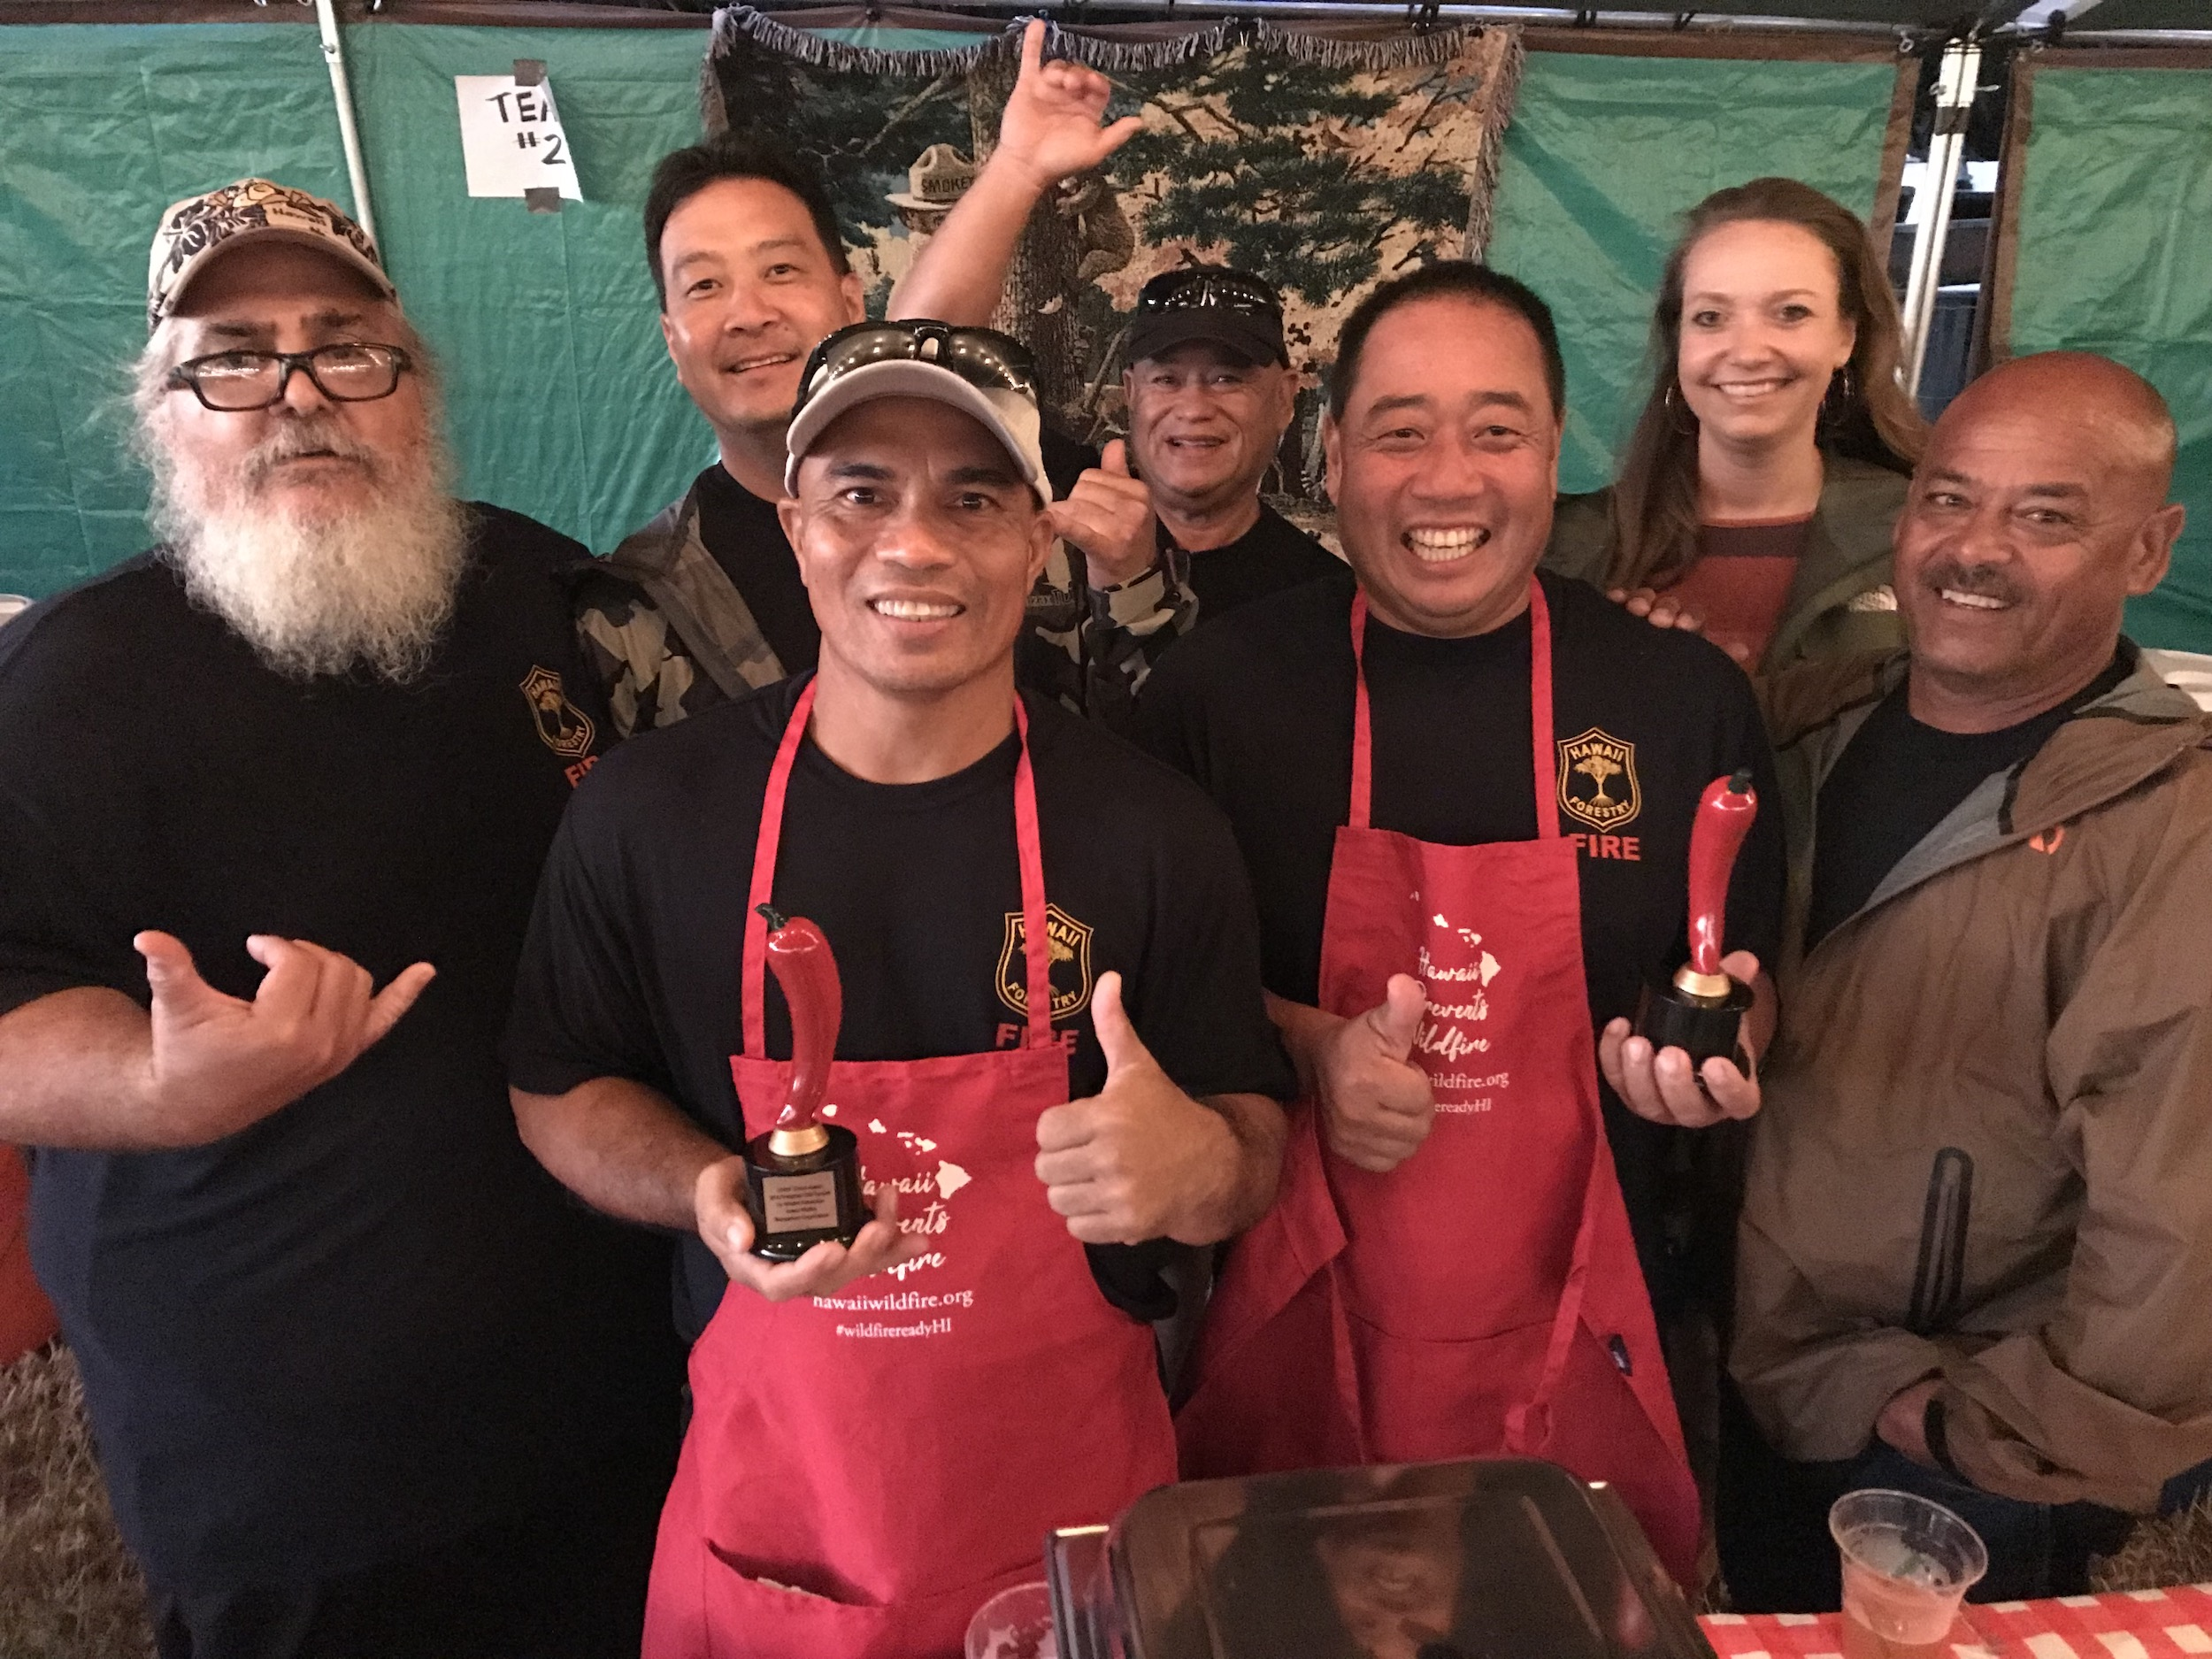 DOFAW won Chef's Choice AND Best Team Spirit in one night!